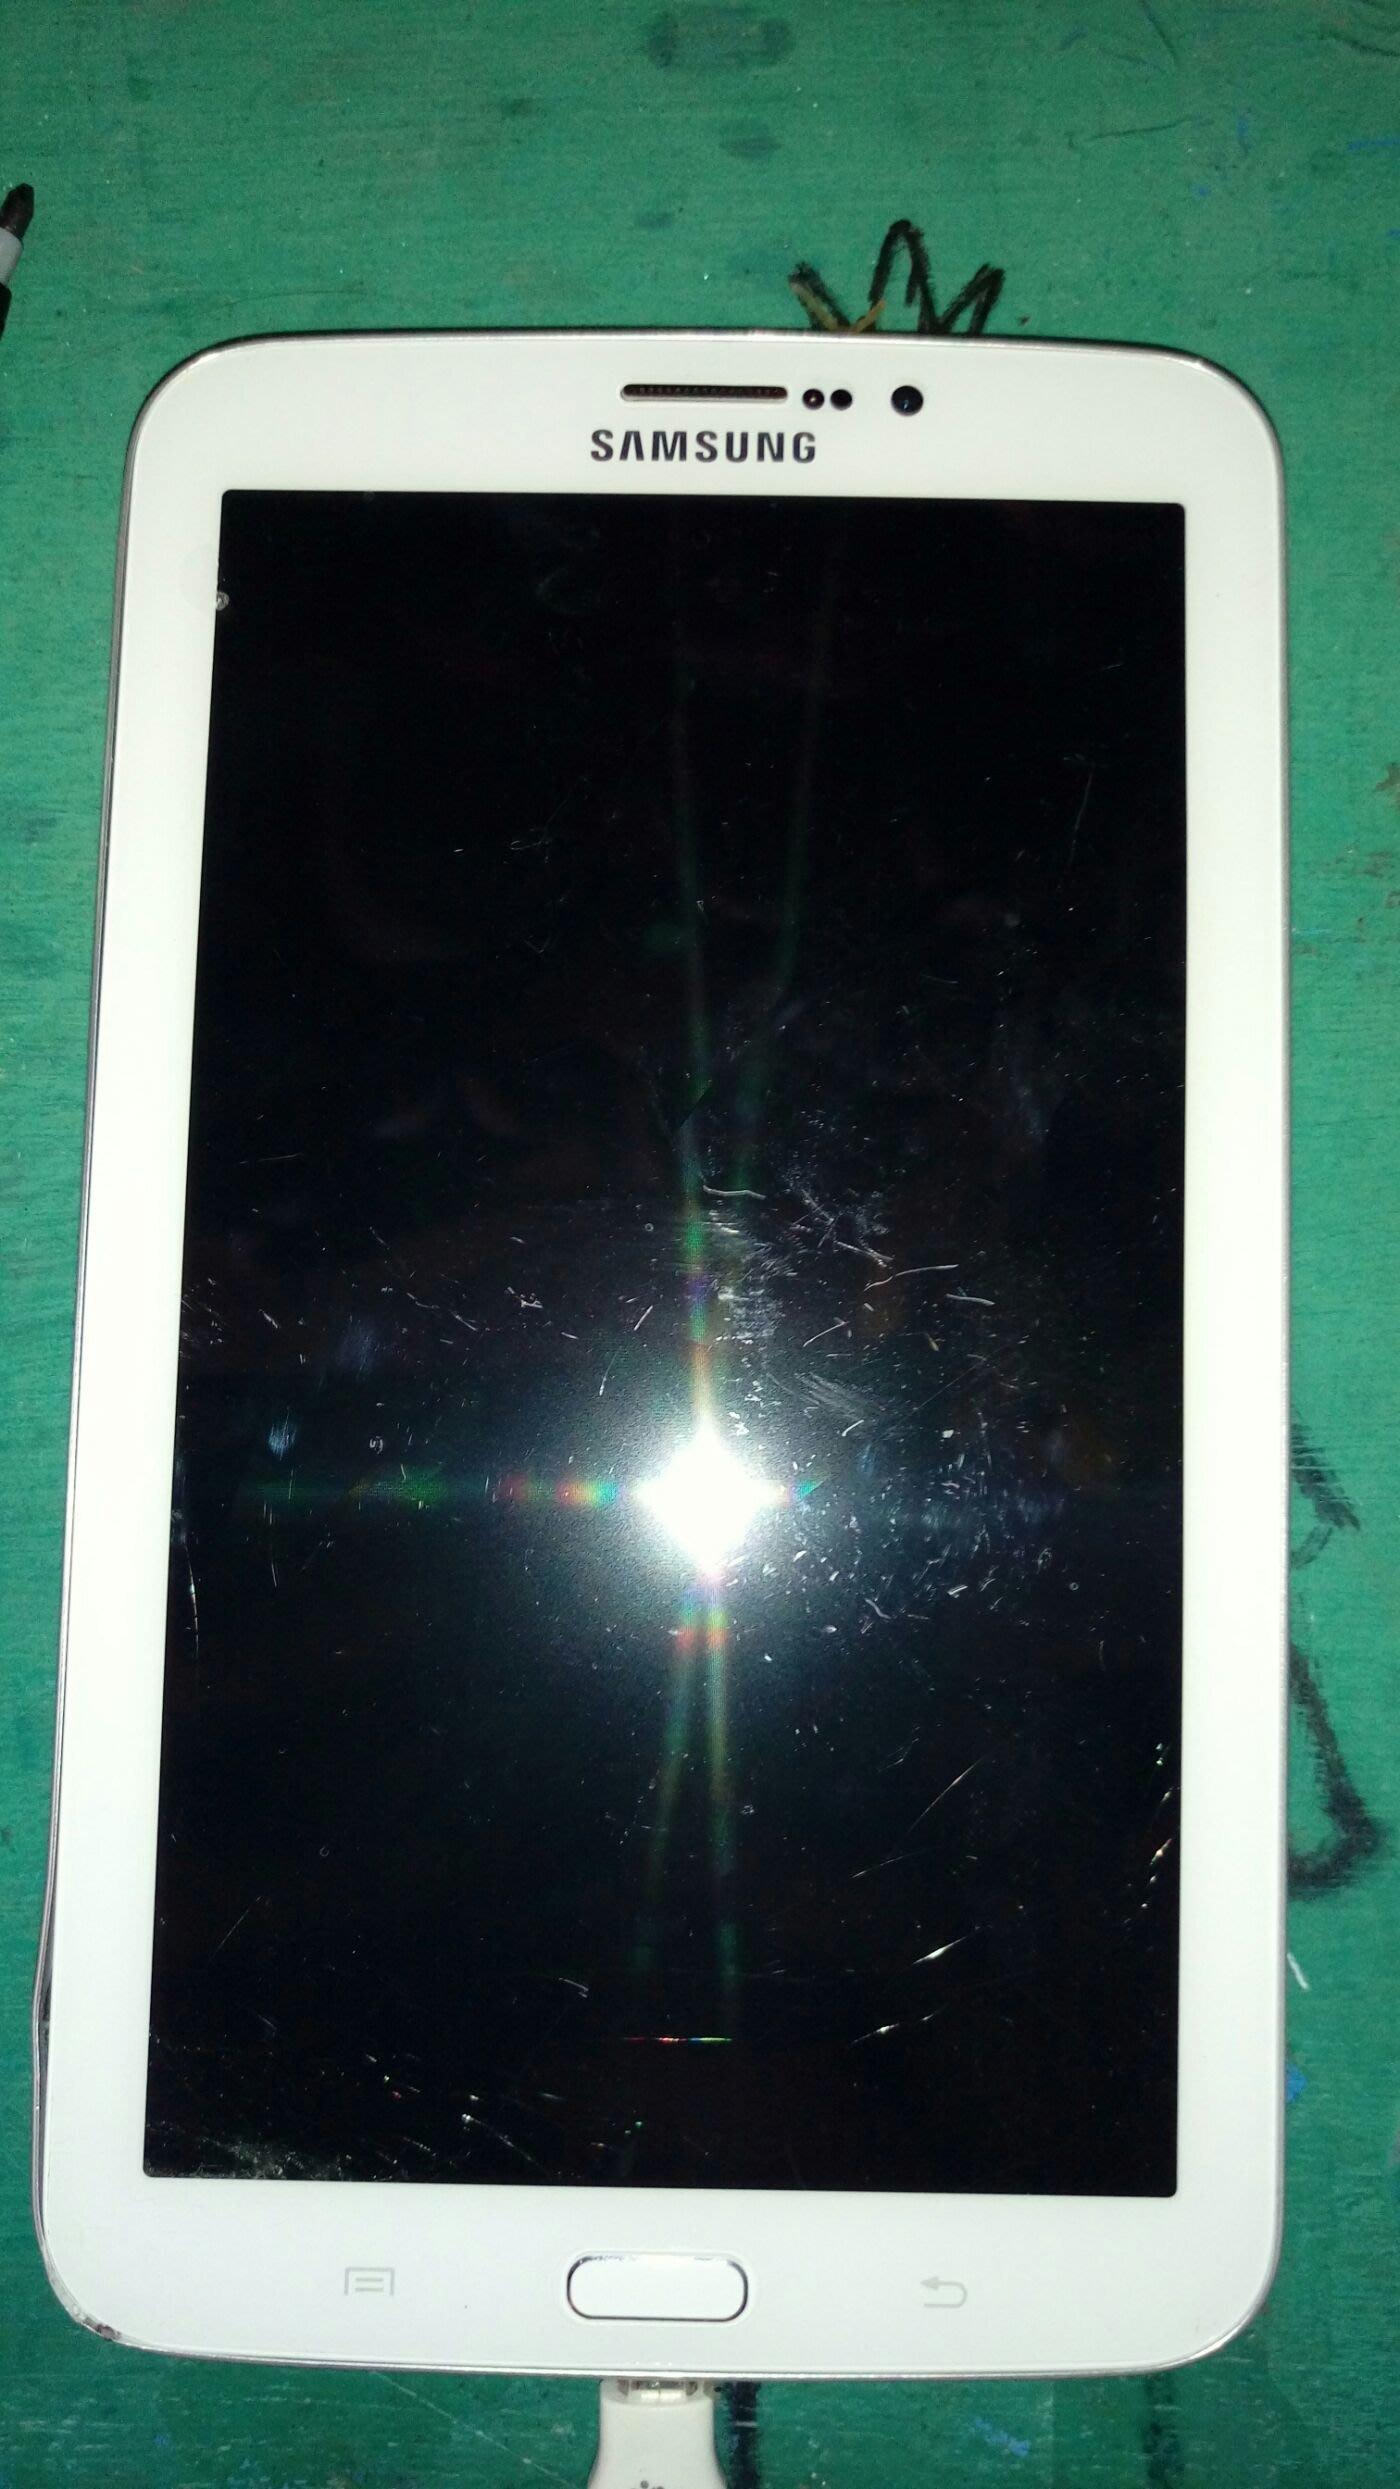 $${故障平板}三星Samsung Tab 3 sm-t211 白色$$